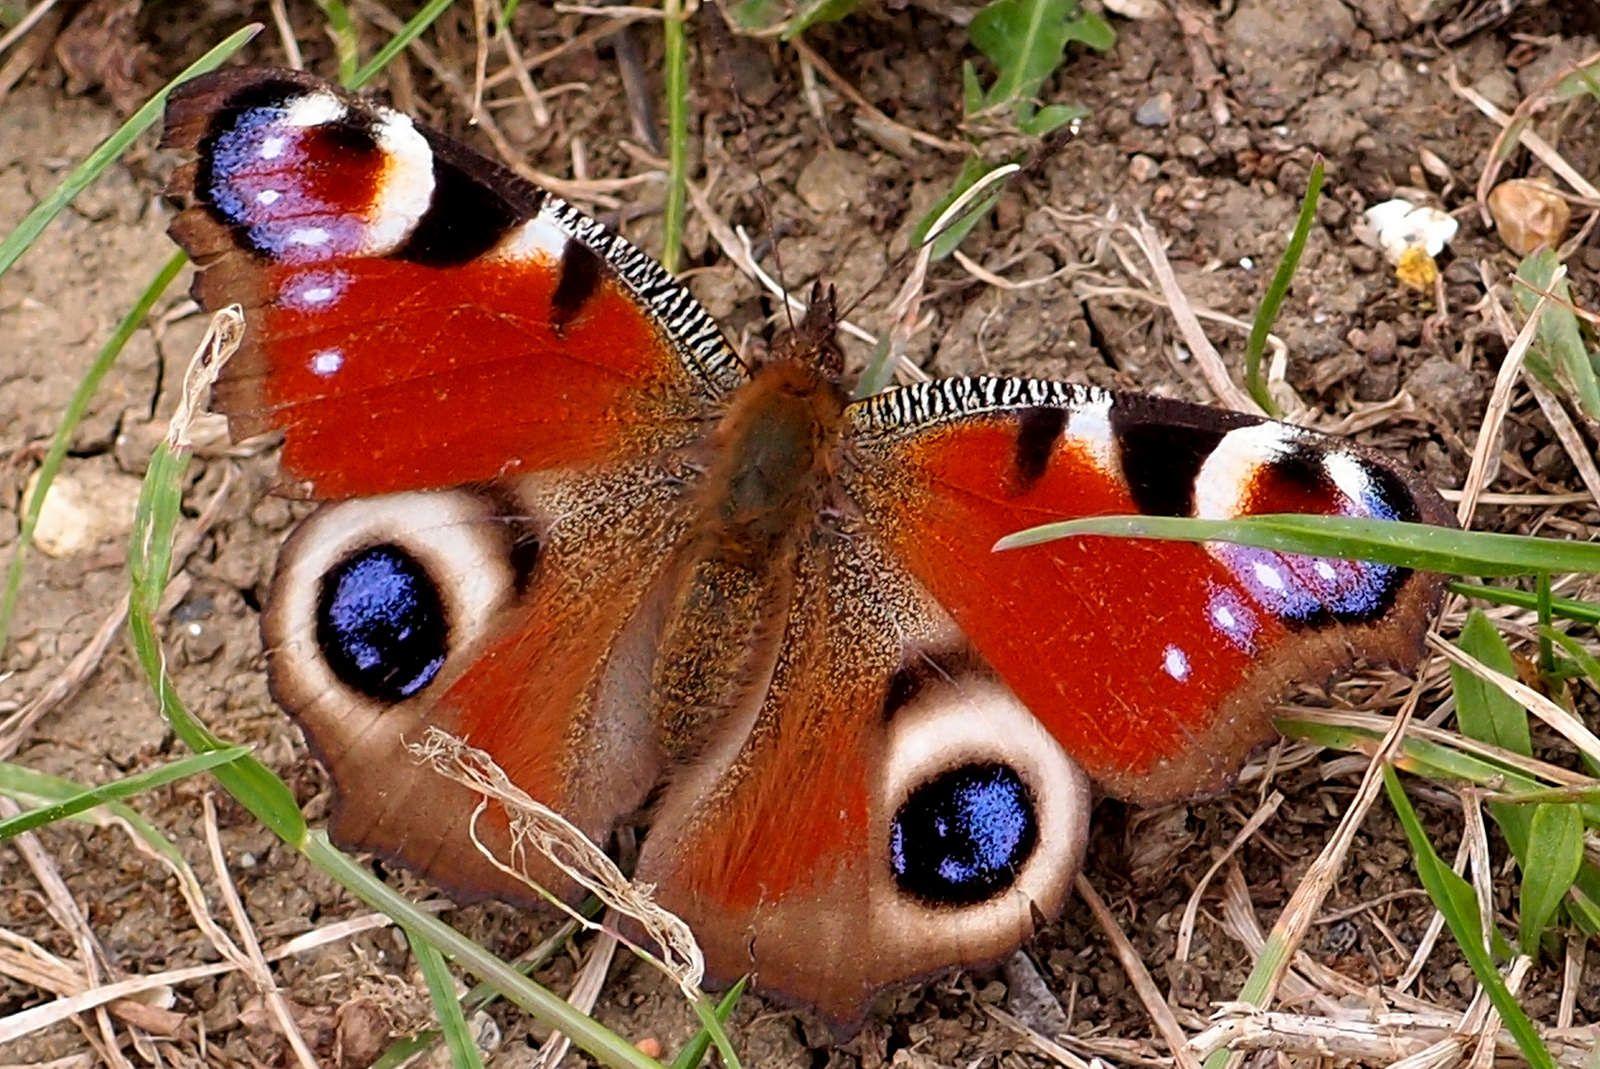 Peacock Butterfly Saffron Walden Essex  May 2015   da Saffron Walden Snapper